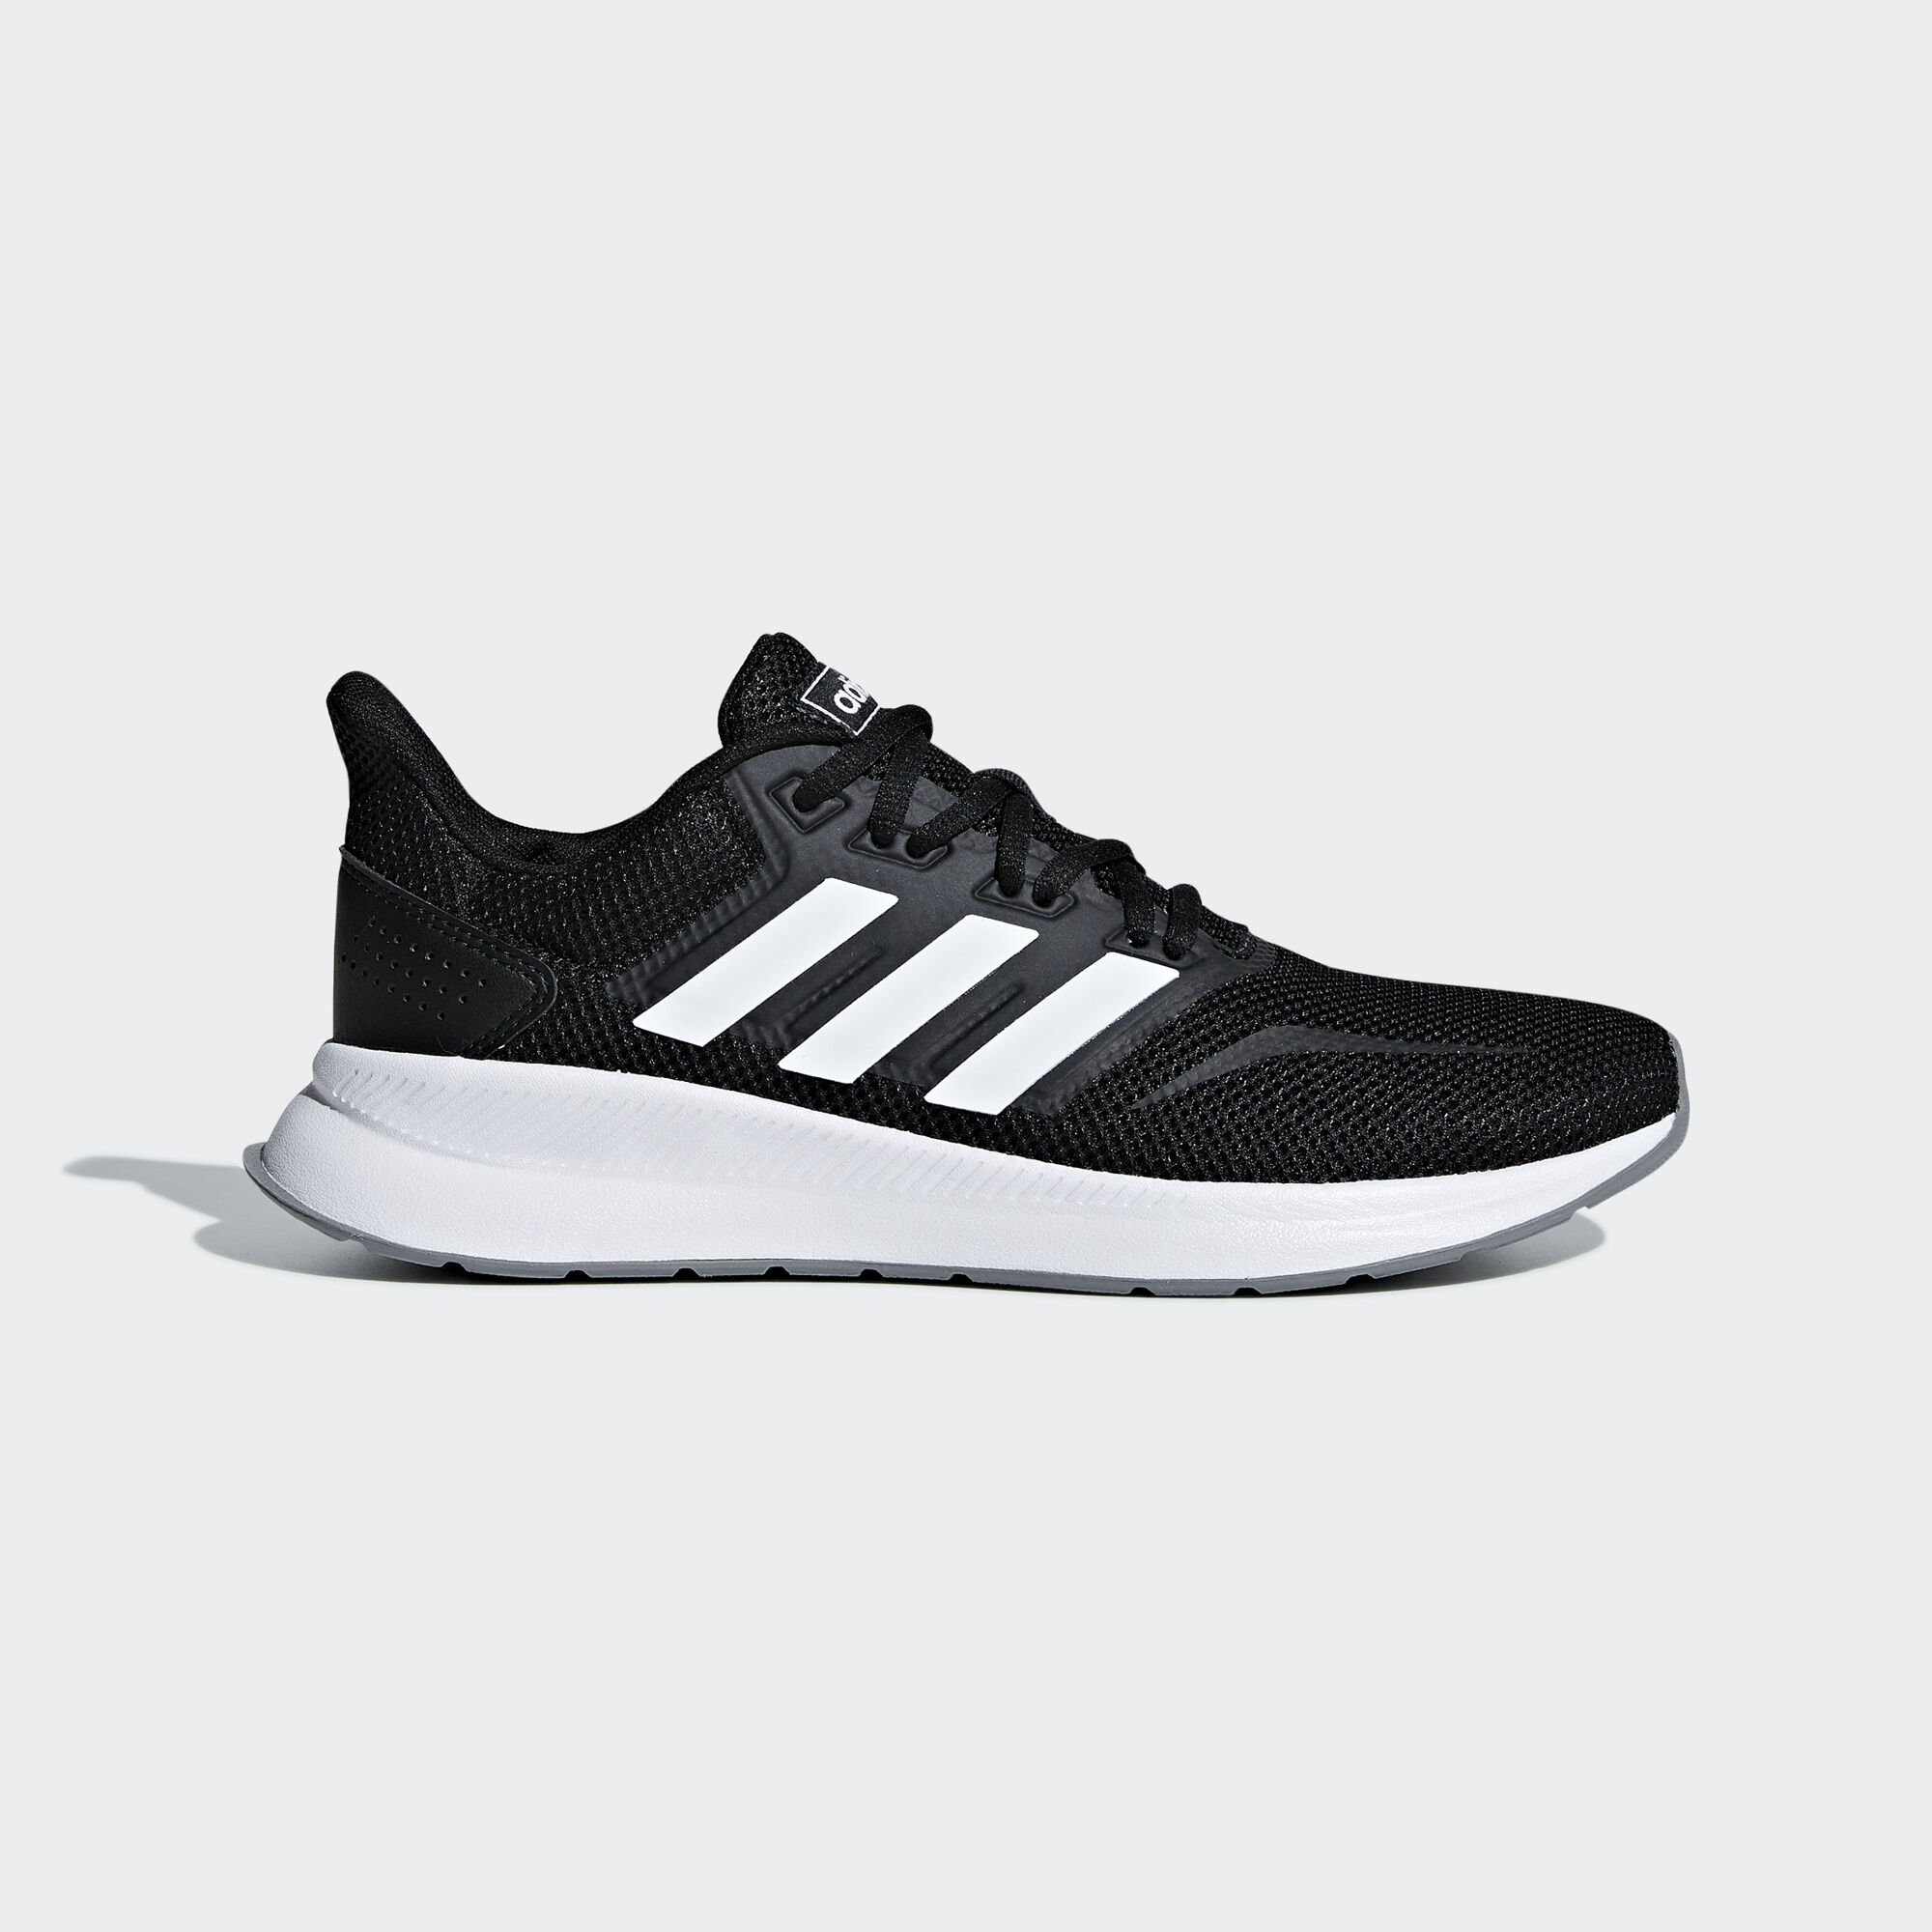 quality design 57d9d 2d294 adidas - Runfalcon Shoes Core Black  Ftwr White  Grey Three F36218